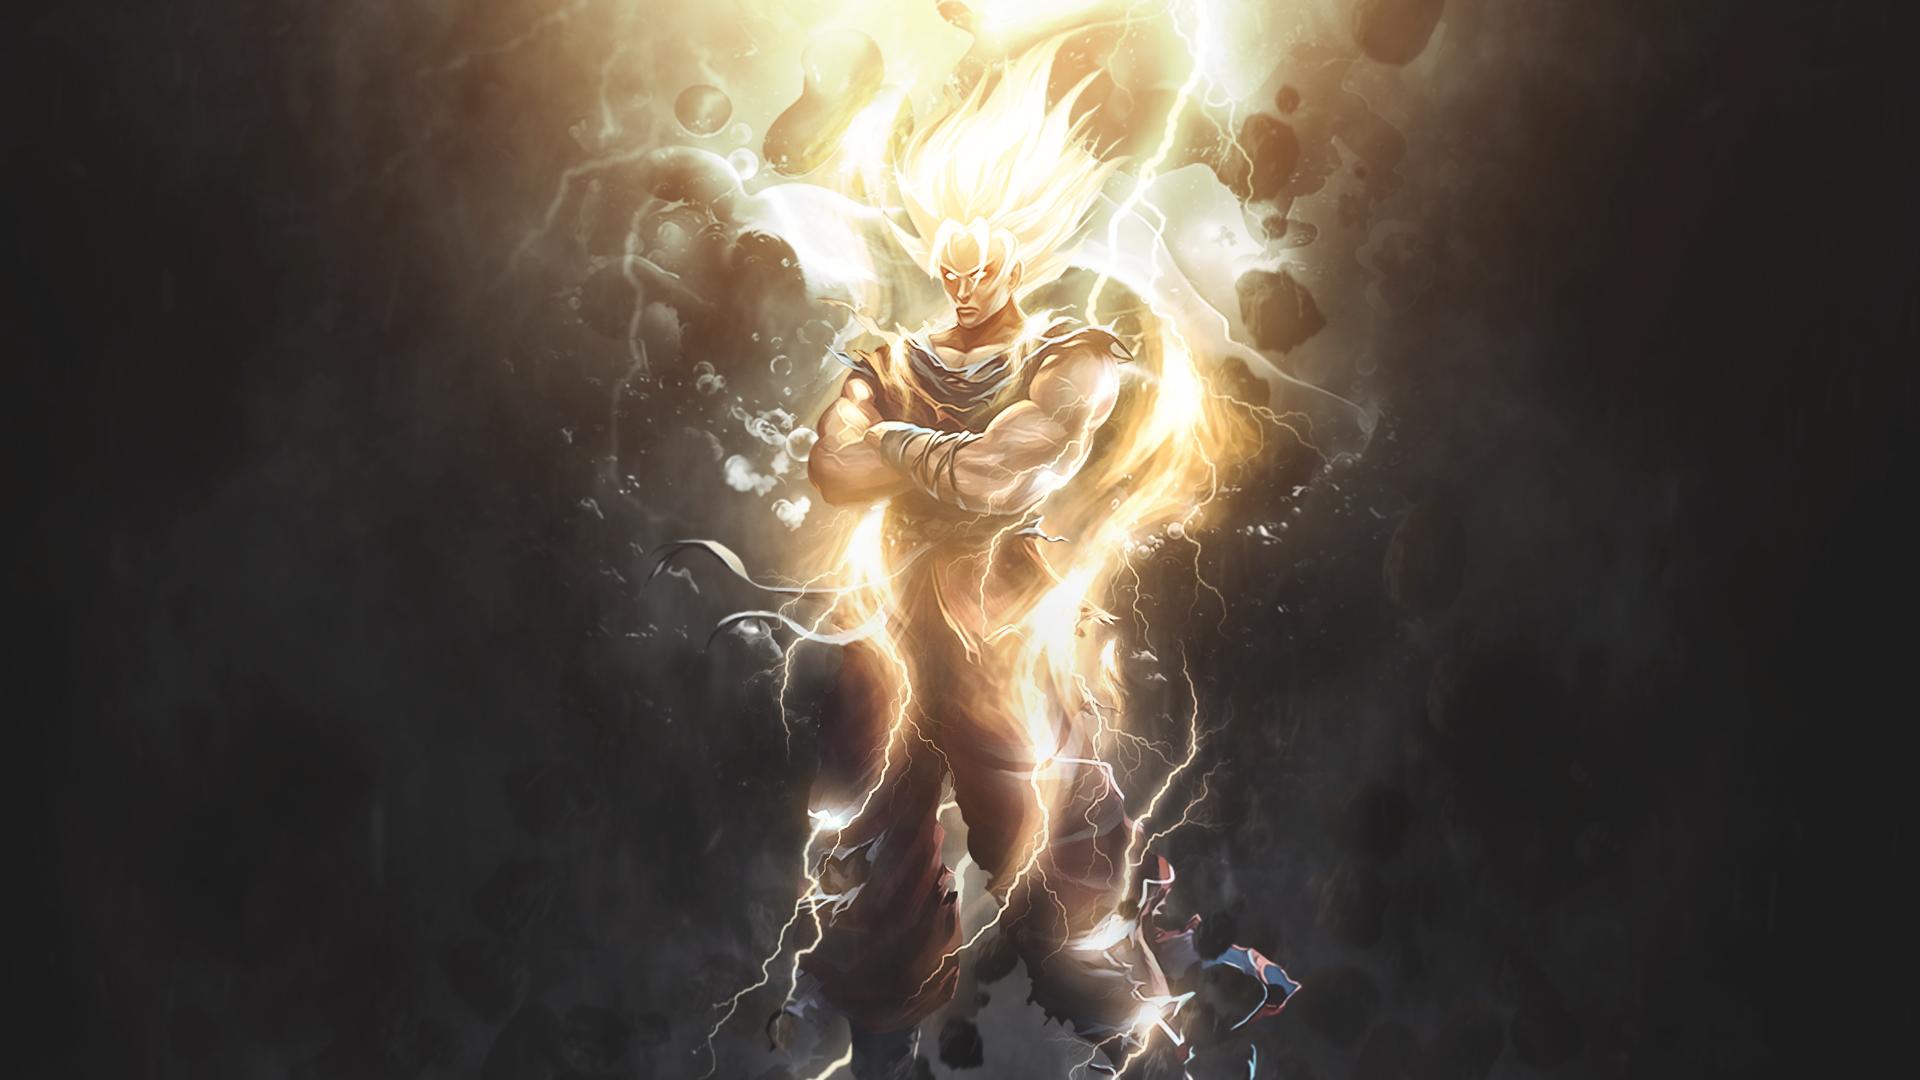 Goku Wallpaper By Strengxd On Deviantart Goku Wallpaper Dragon Ball Wallpapers Dbz Wallpapers